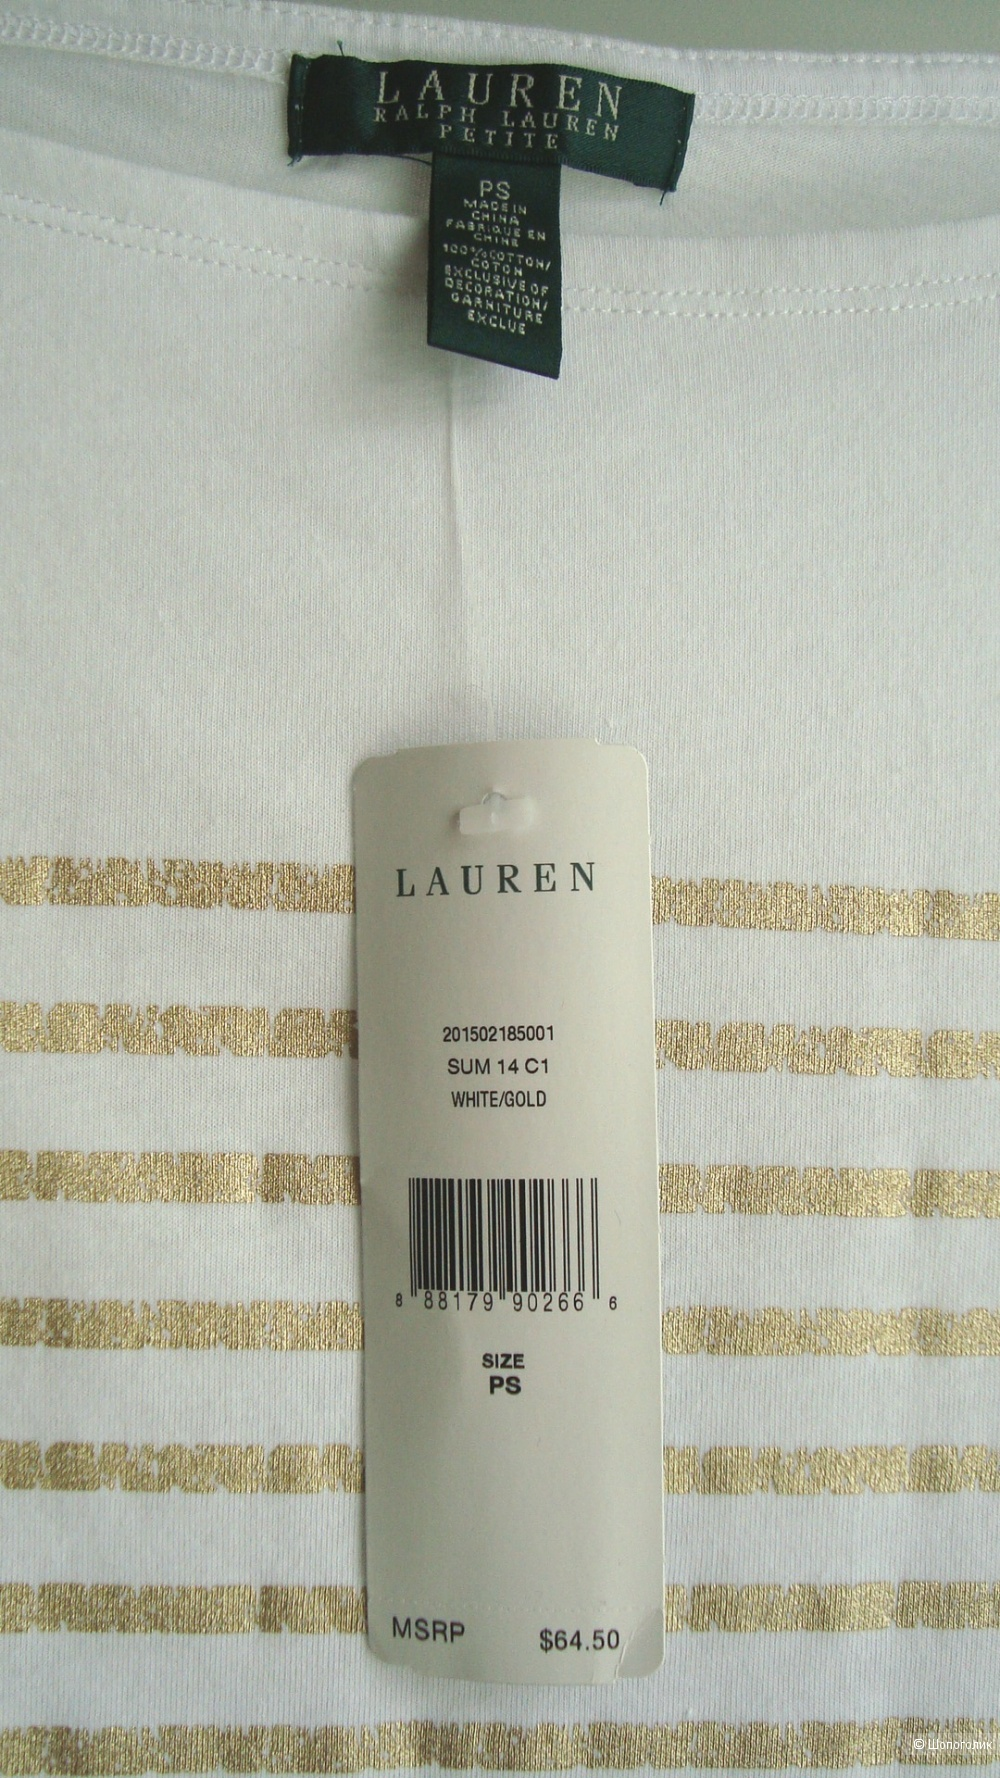 Топ Ralph Lauren, размер: Petite S